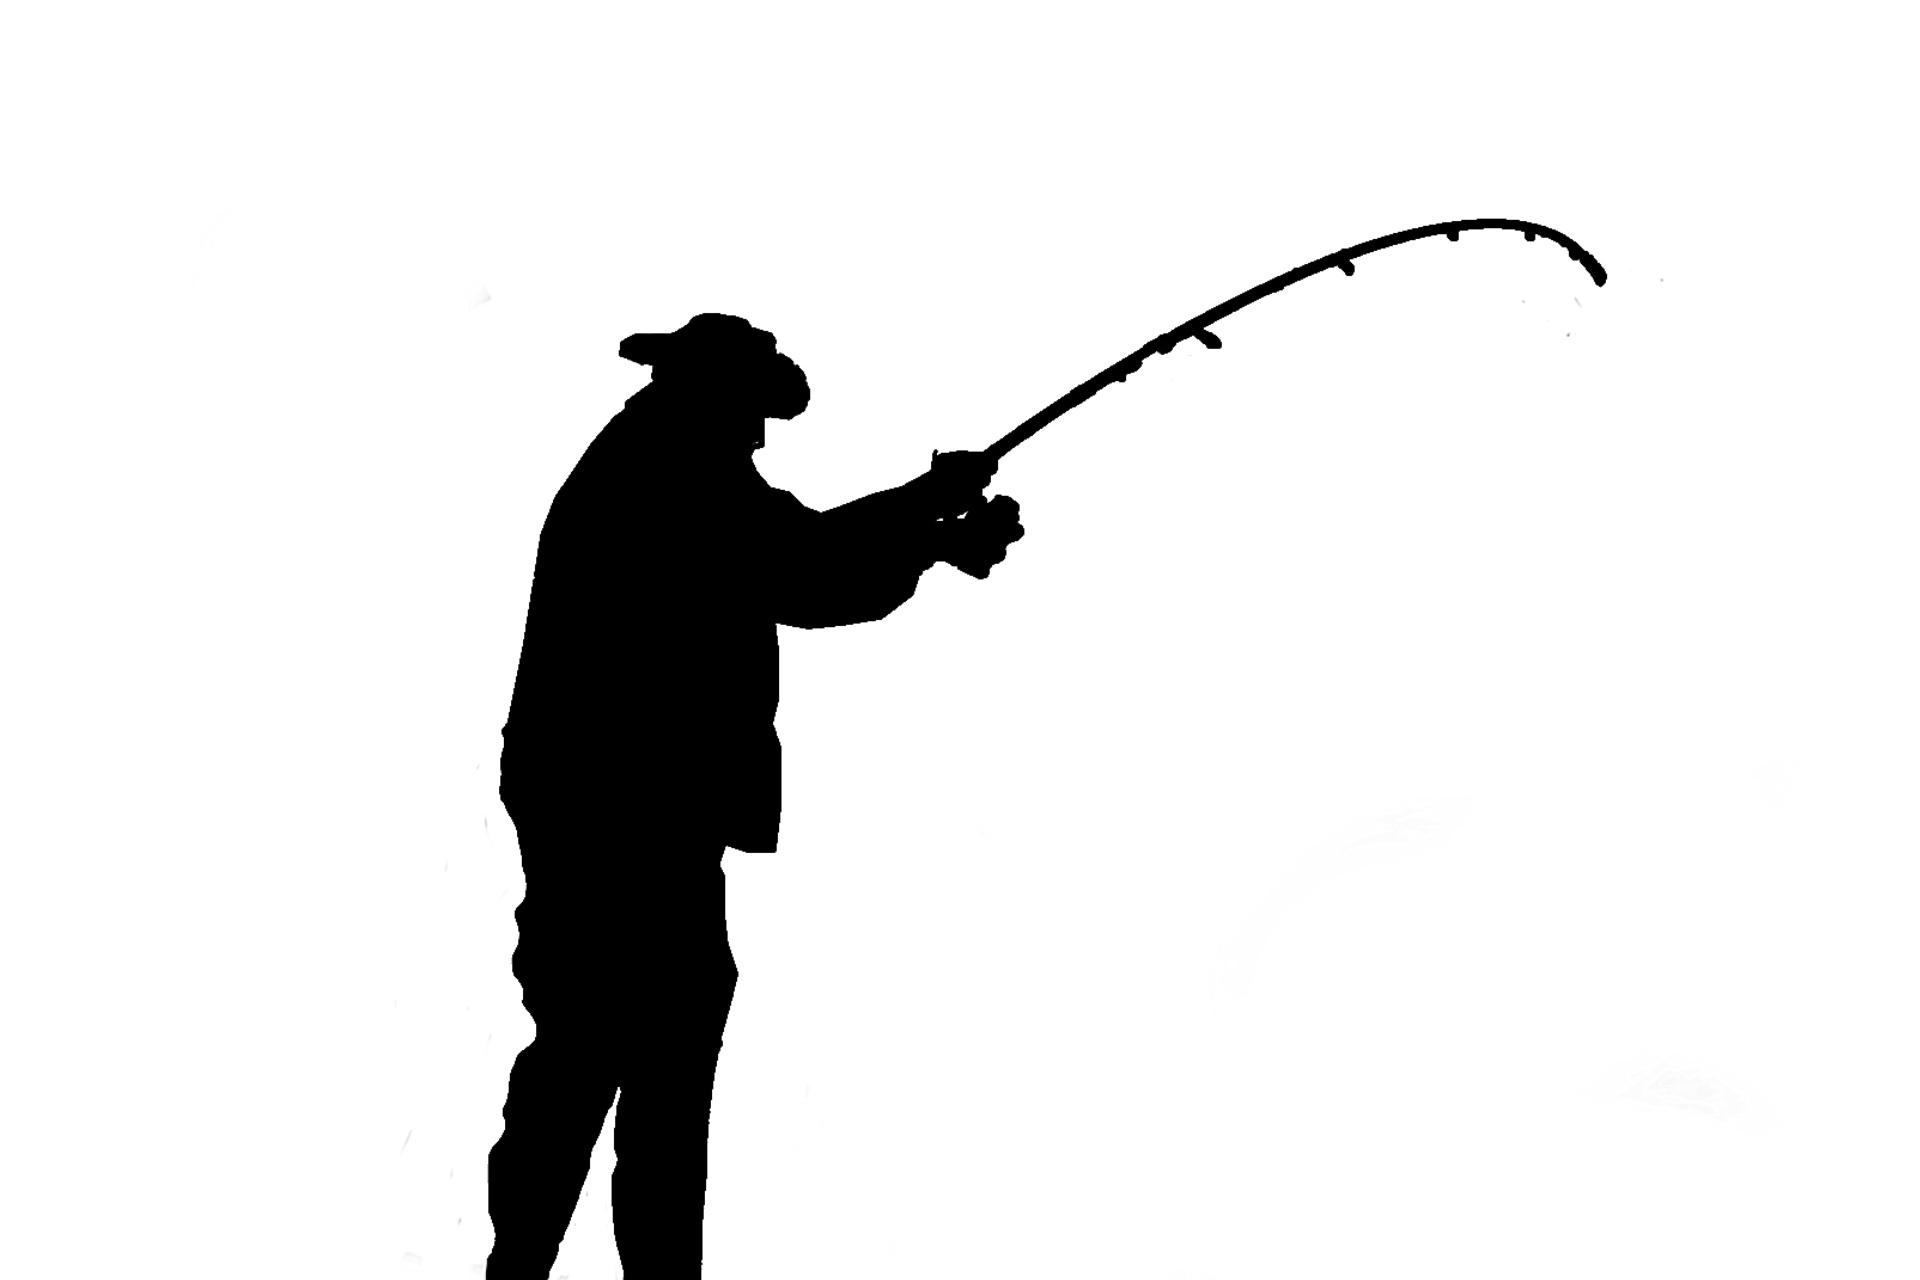 1920x1280 Angler Silhouette Free Stock Photo